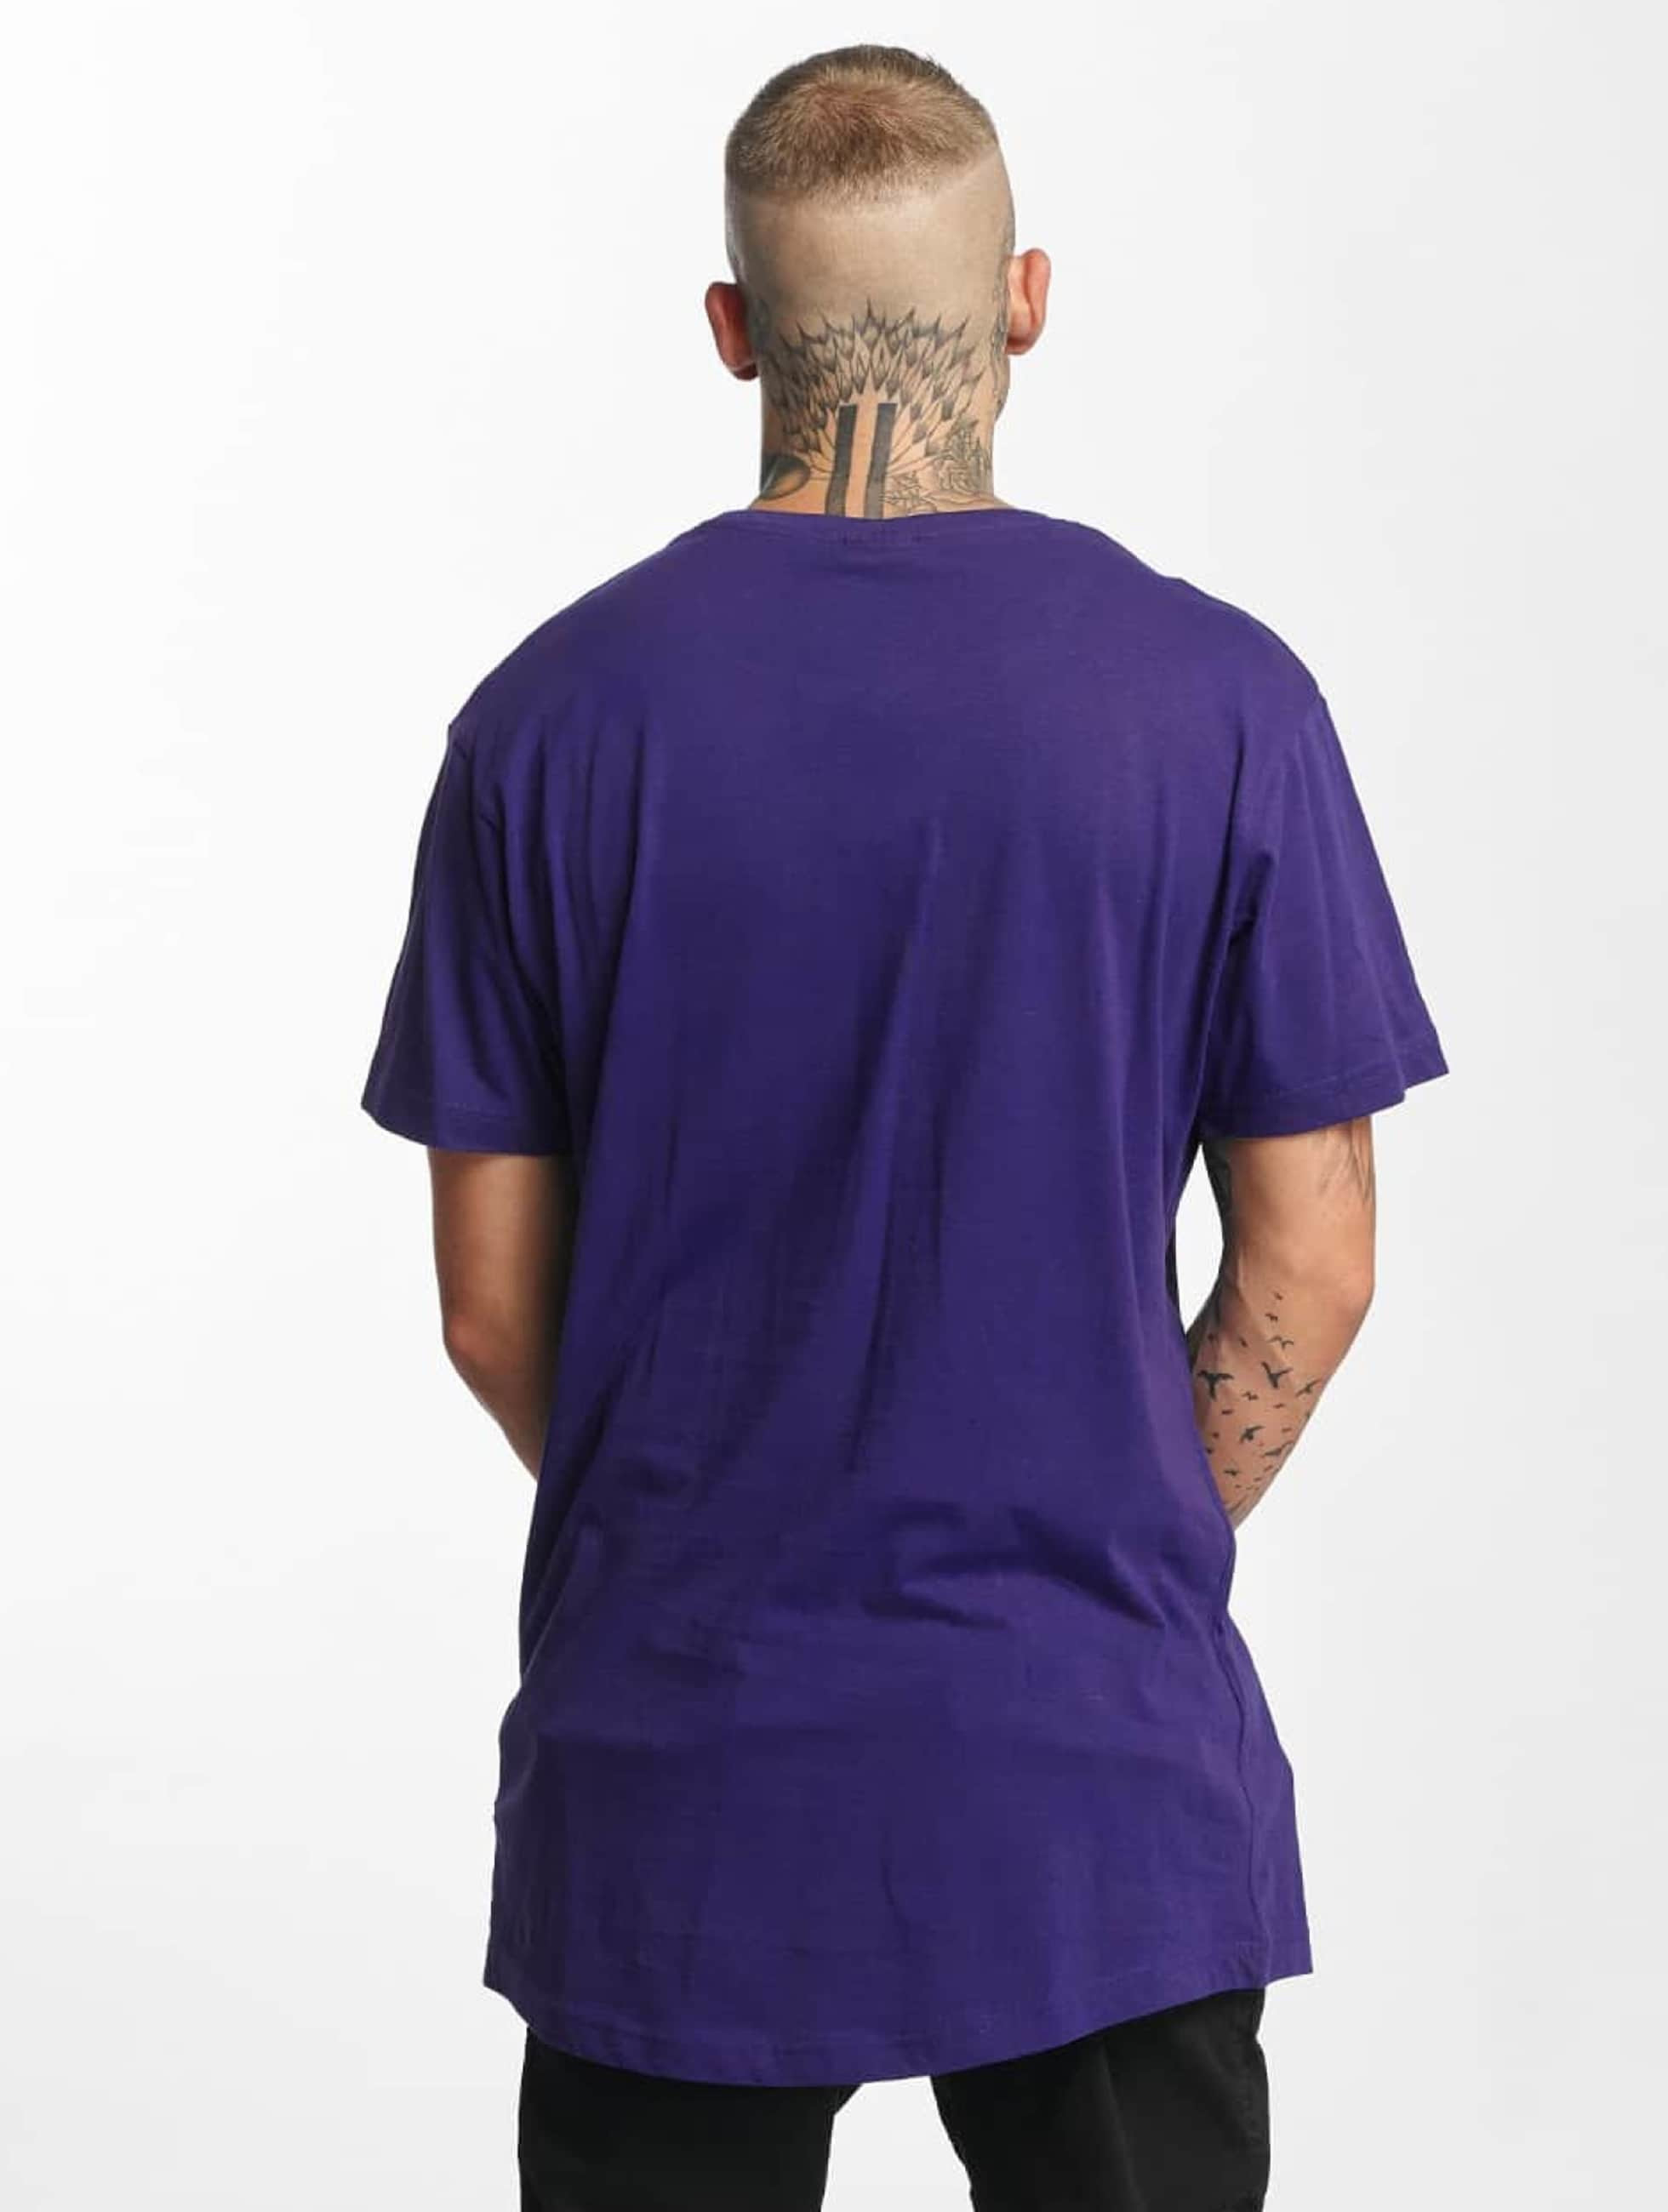 Urban Classics Tall Tees Shaped Oversized Long púrpura